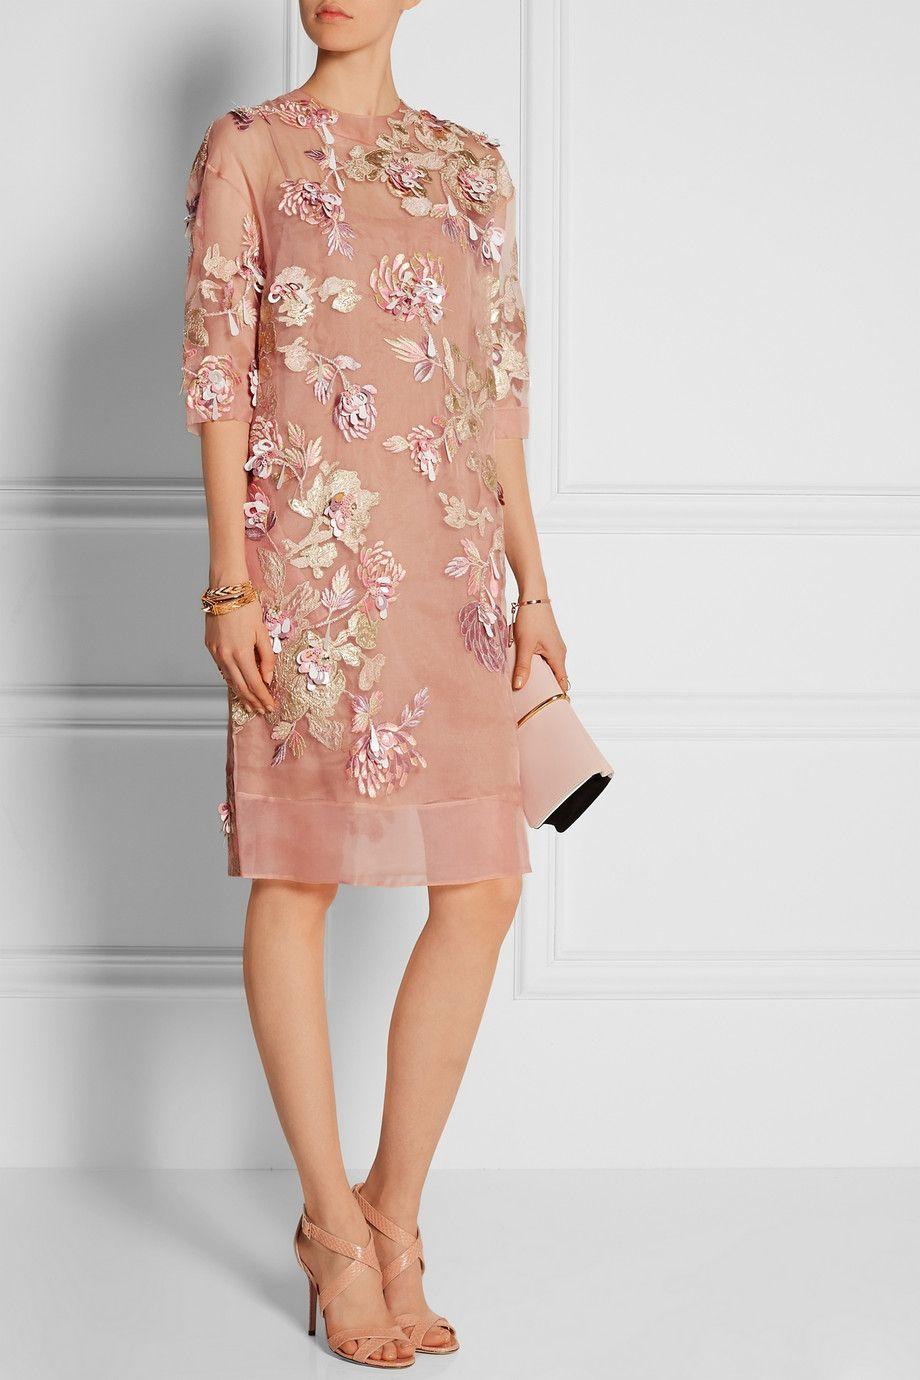 Biyan is fast becoming one of my favorite brands. (Biyan | Ava embellished silk-blend organza dress)